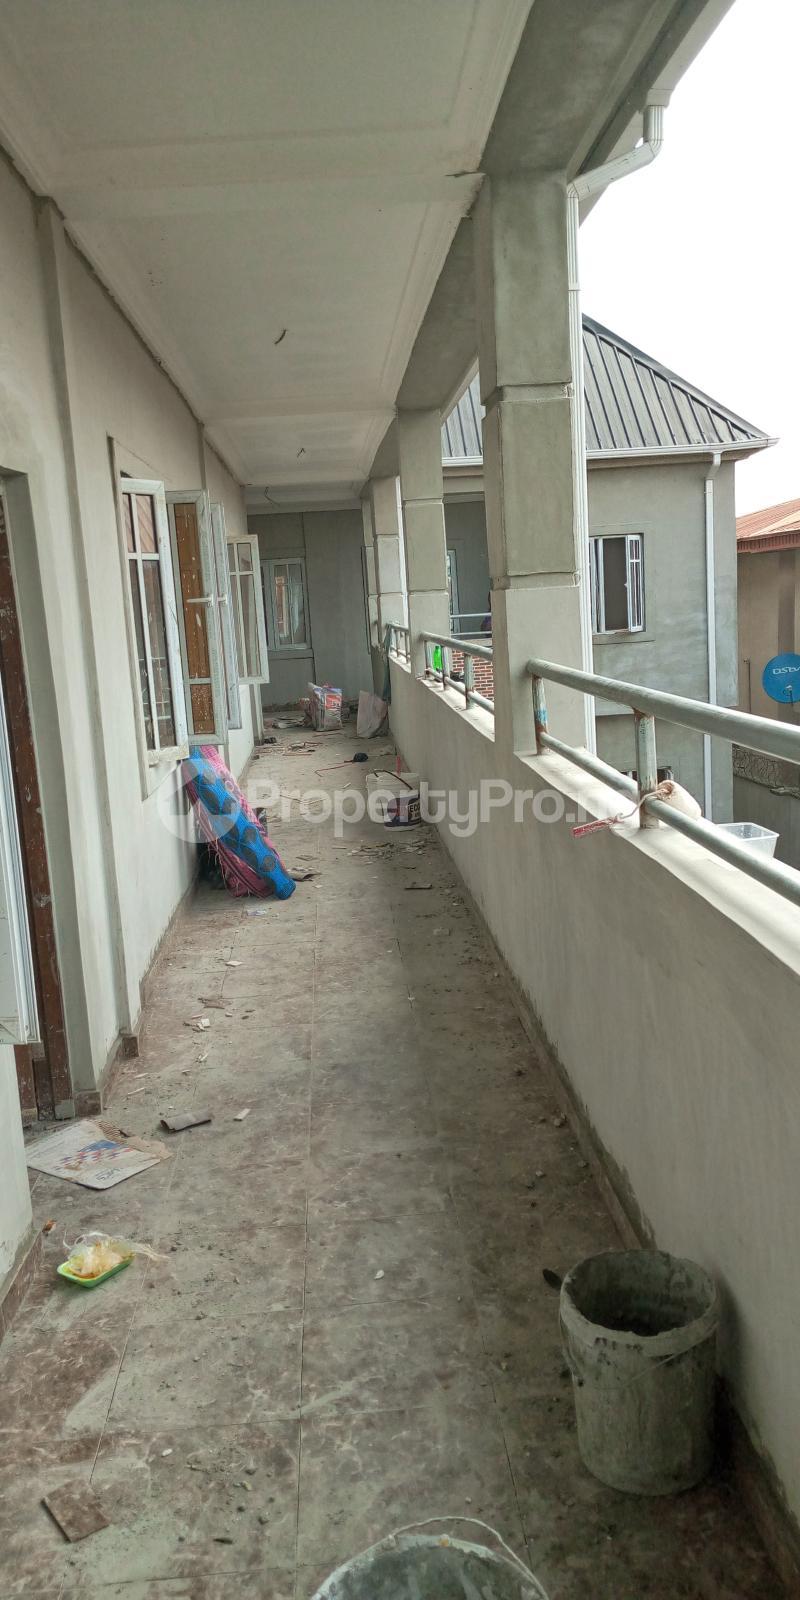 School Commercial Property for sale Eputu Ibeju-Lekki Lagos - 6